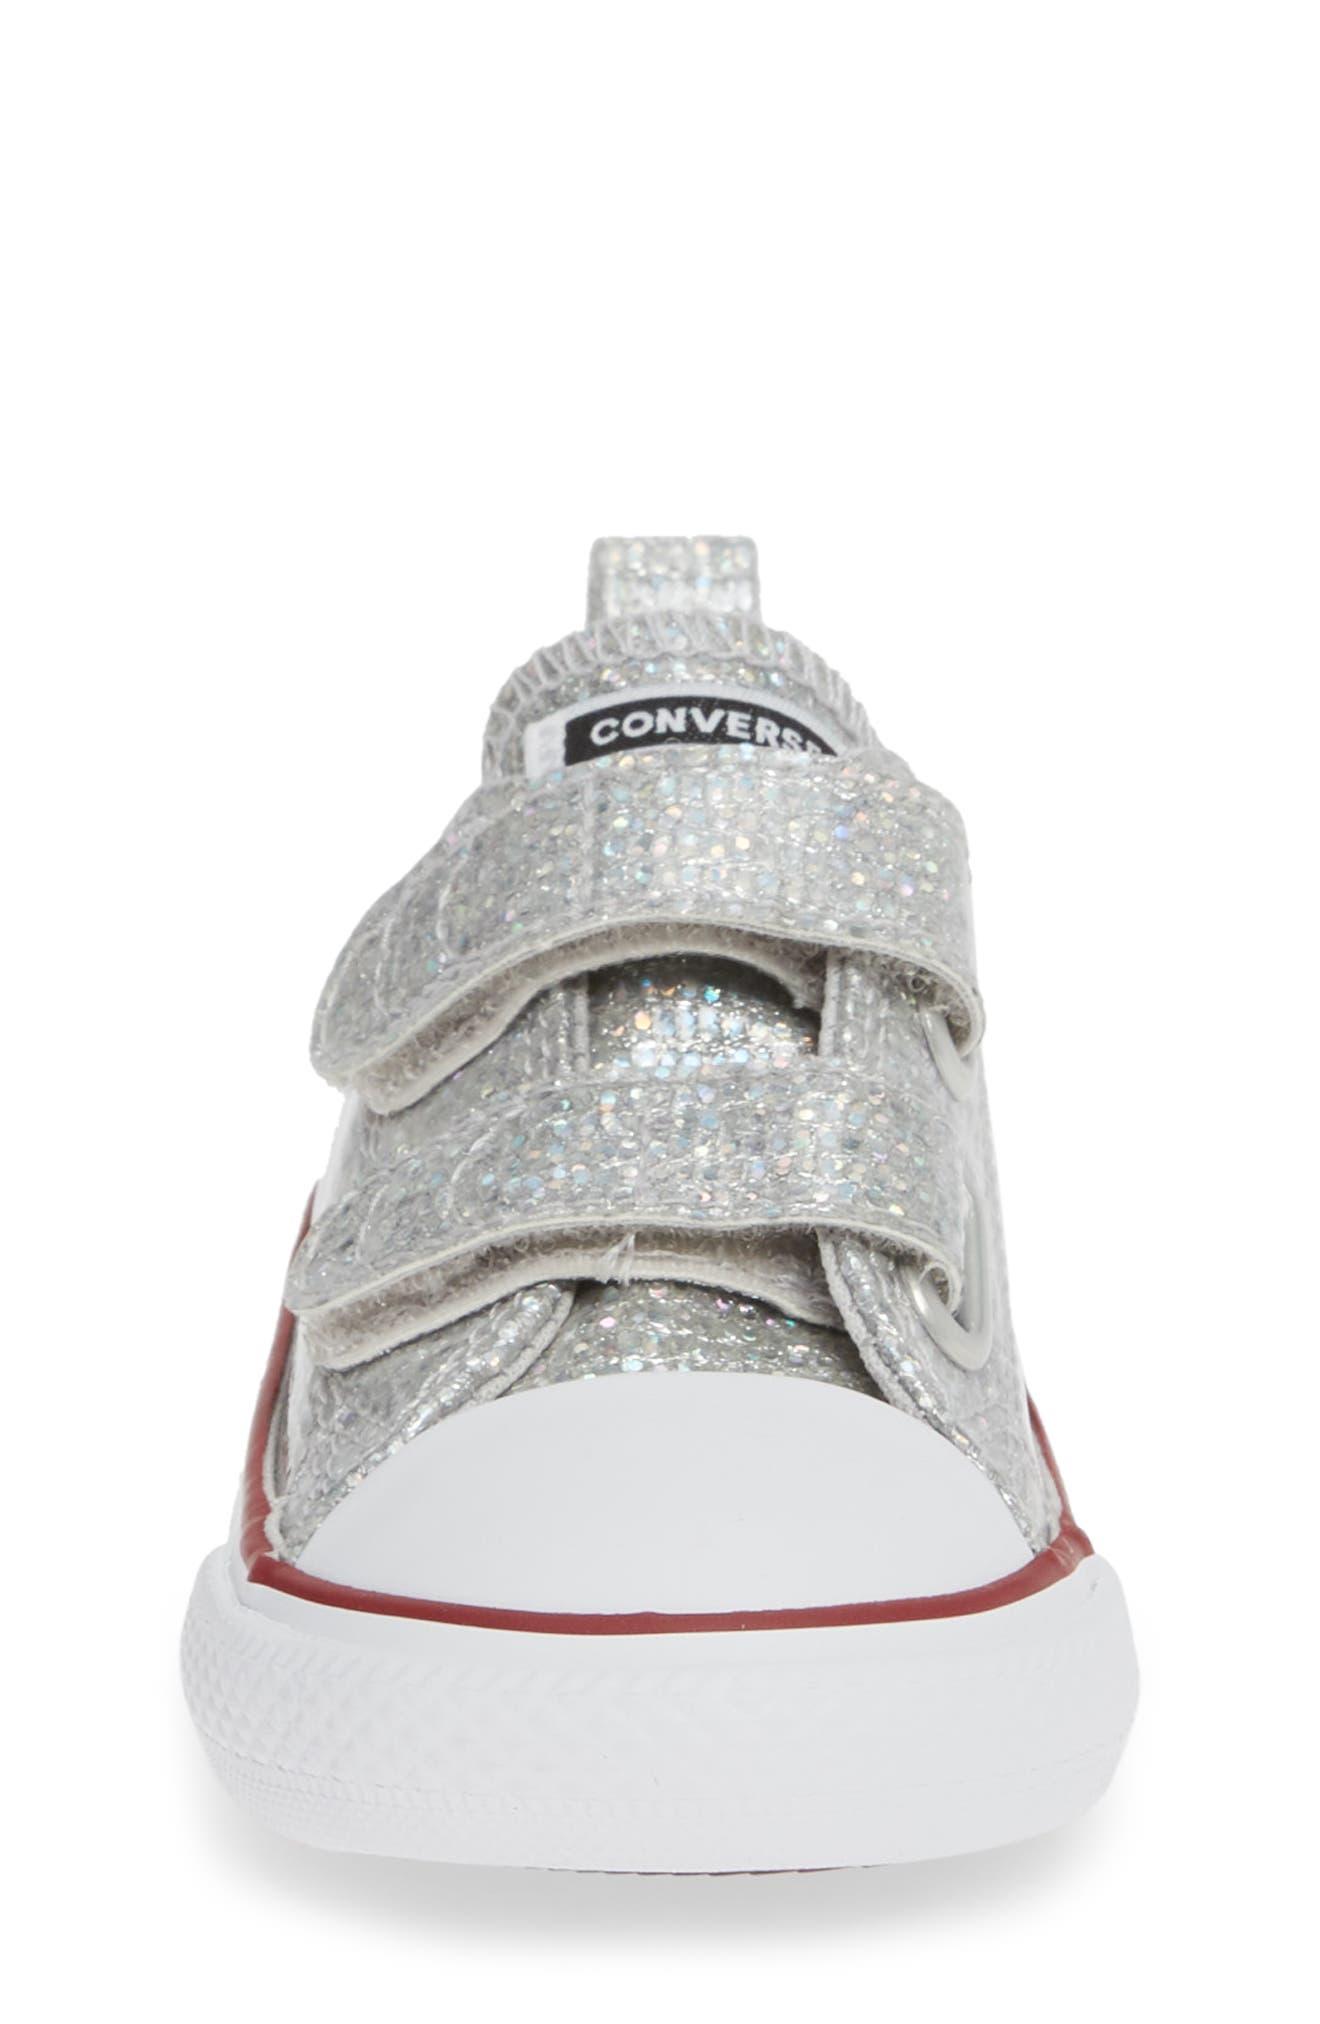 All Star<sup>®</sup> Seasonal Glitter Sneaker,                             Alternate thumbnail 4, color,                             050